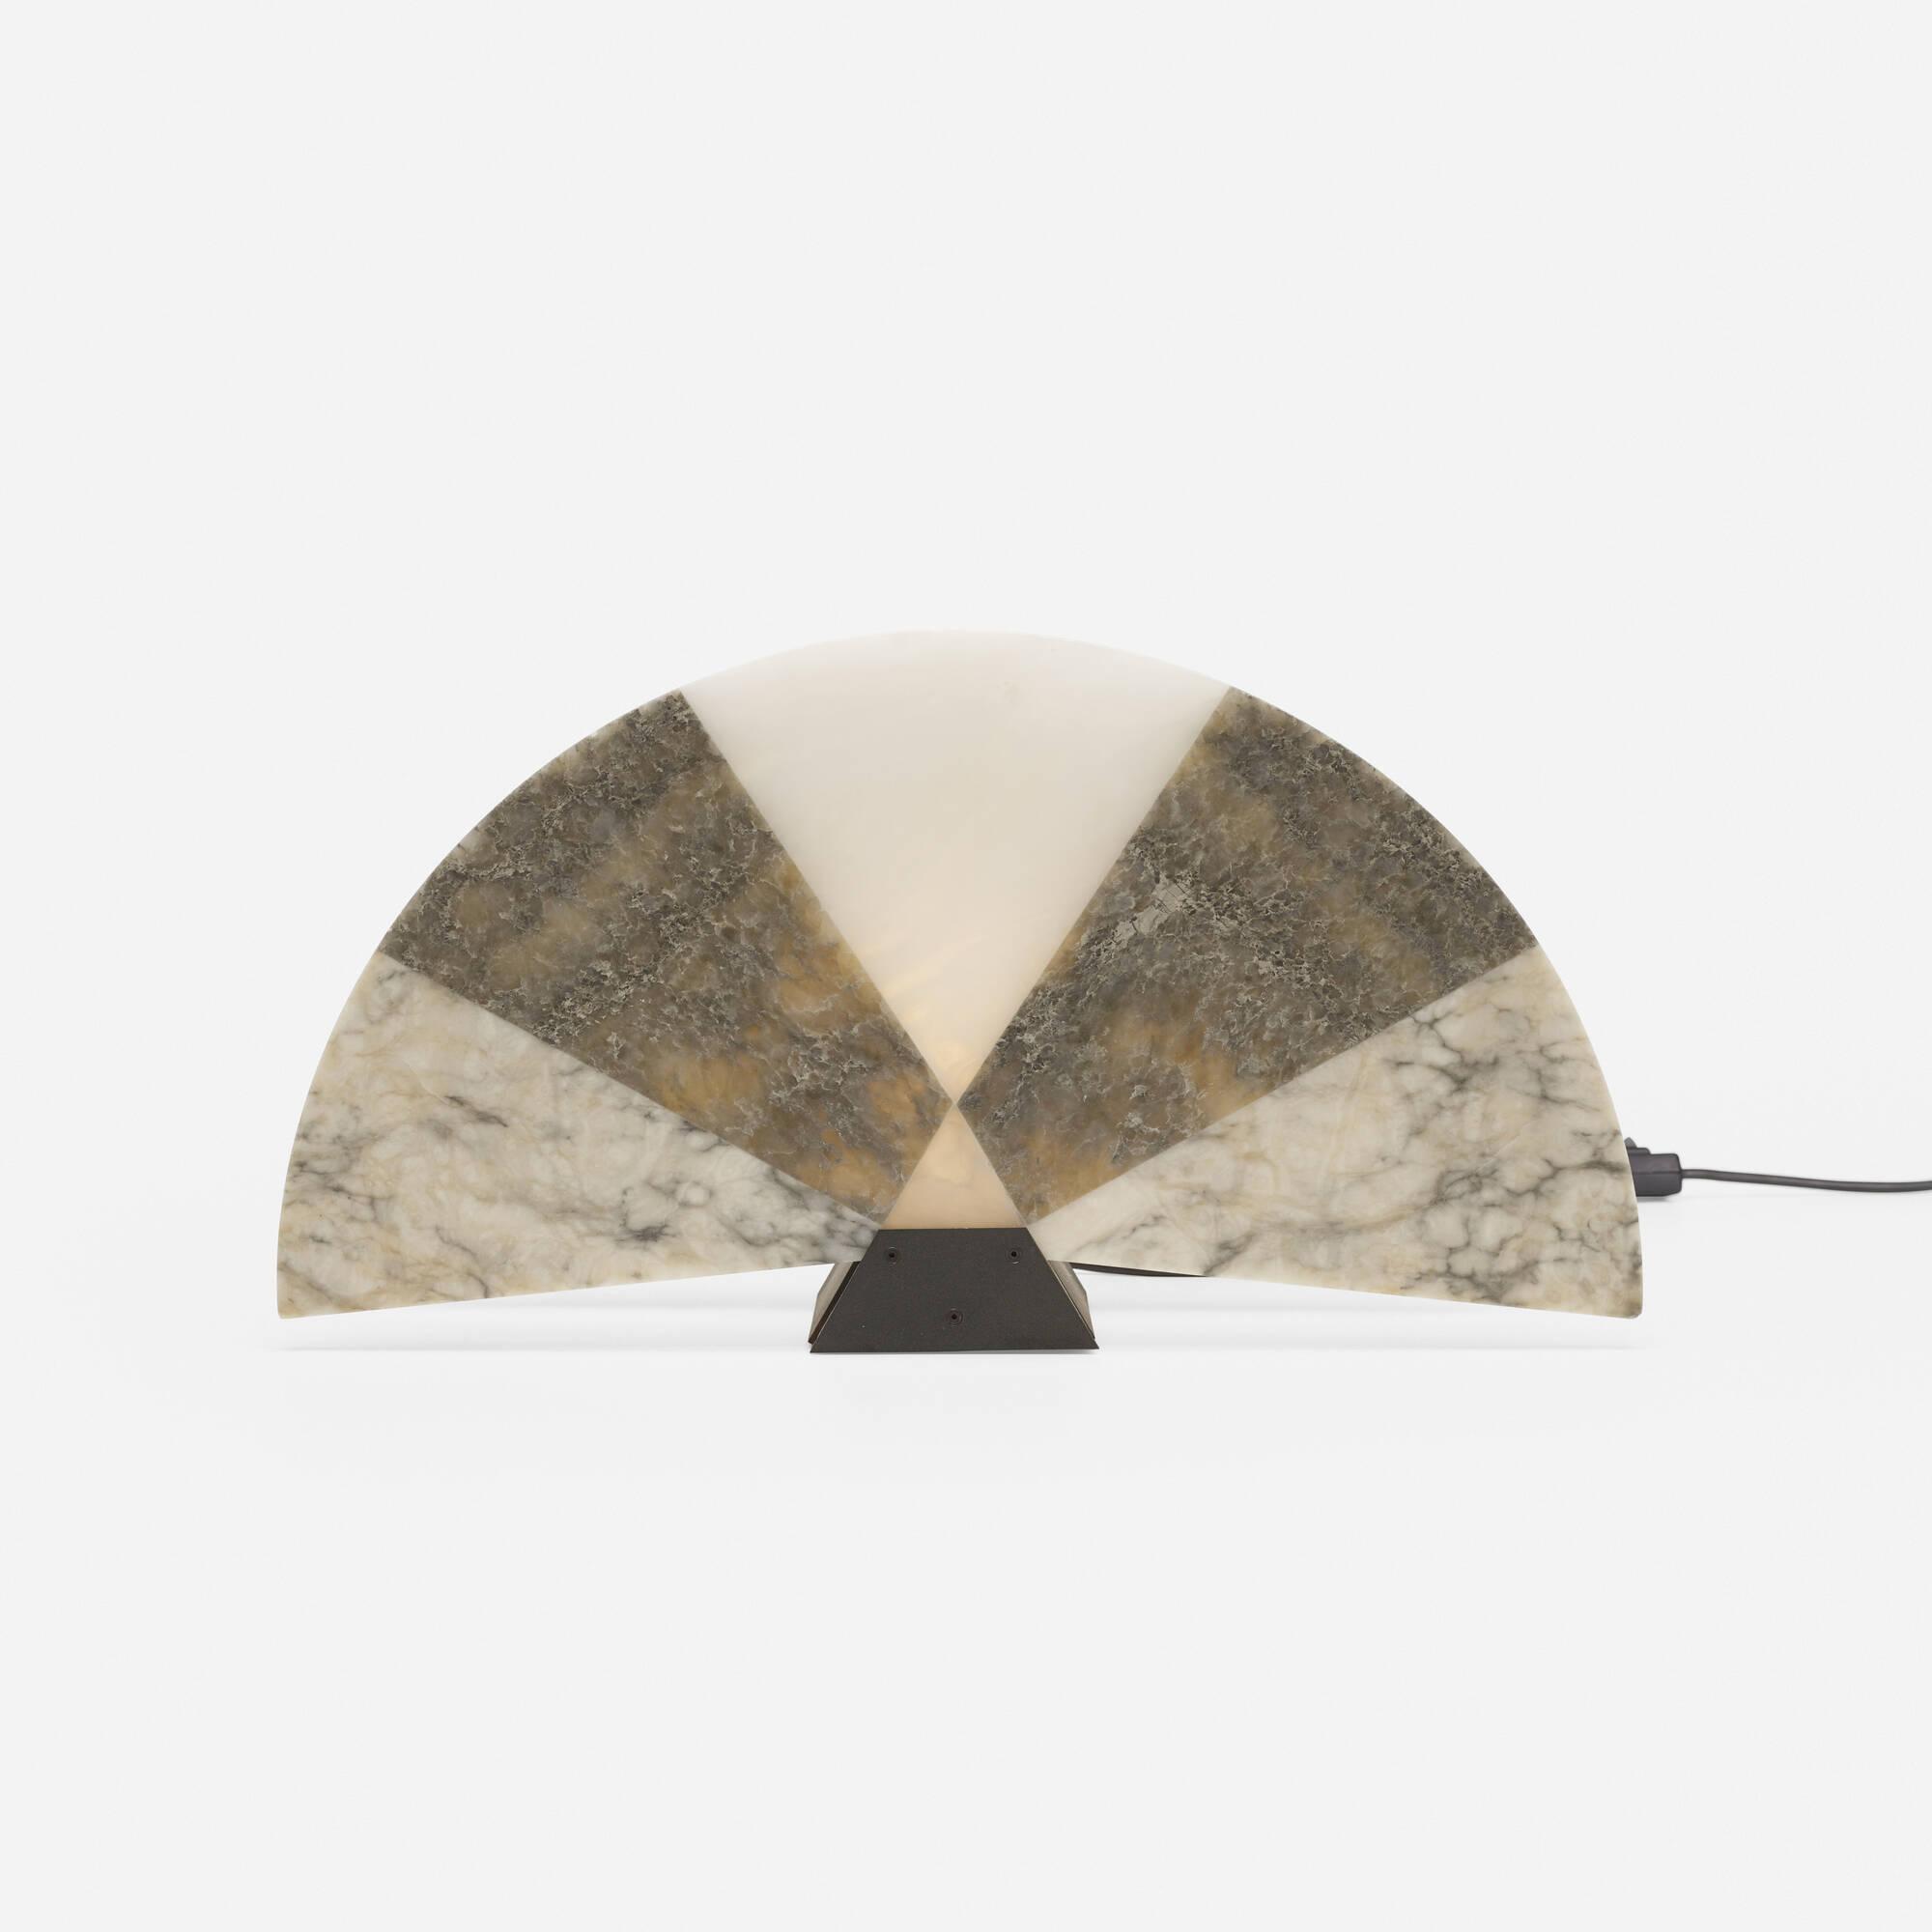 525: Angelo Mangiarotti / Ventiglio table lamp model V584 (1 of 2)